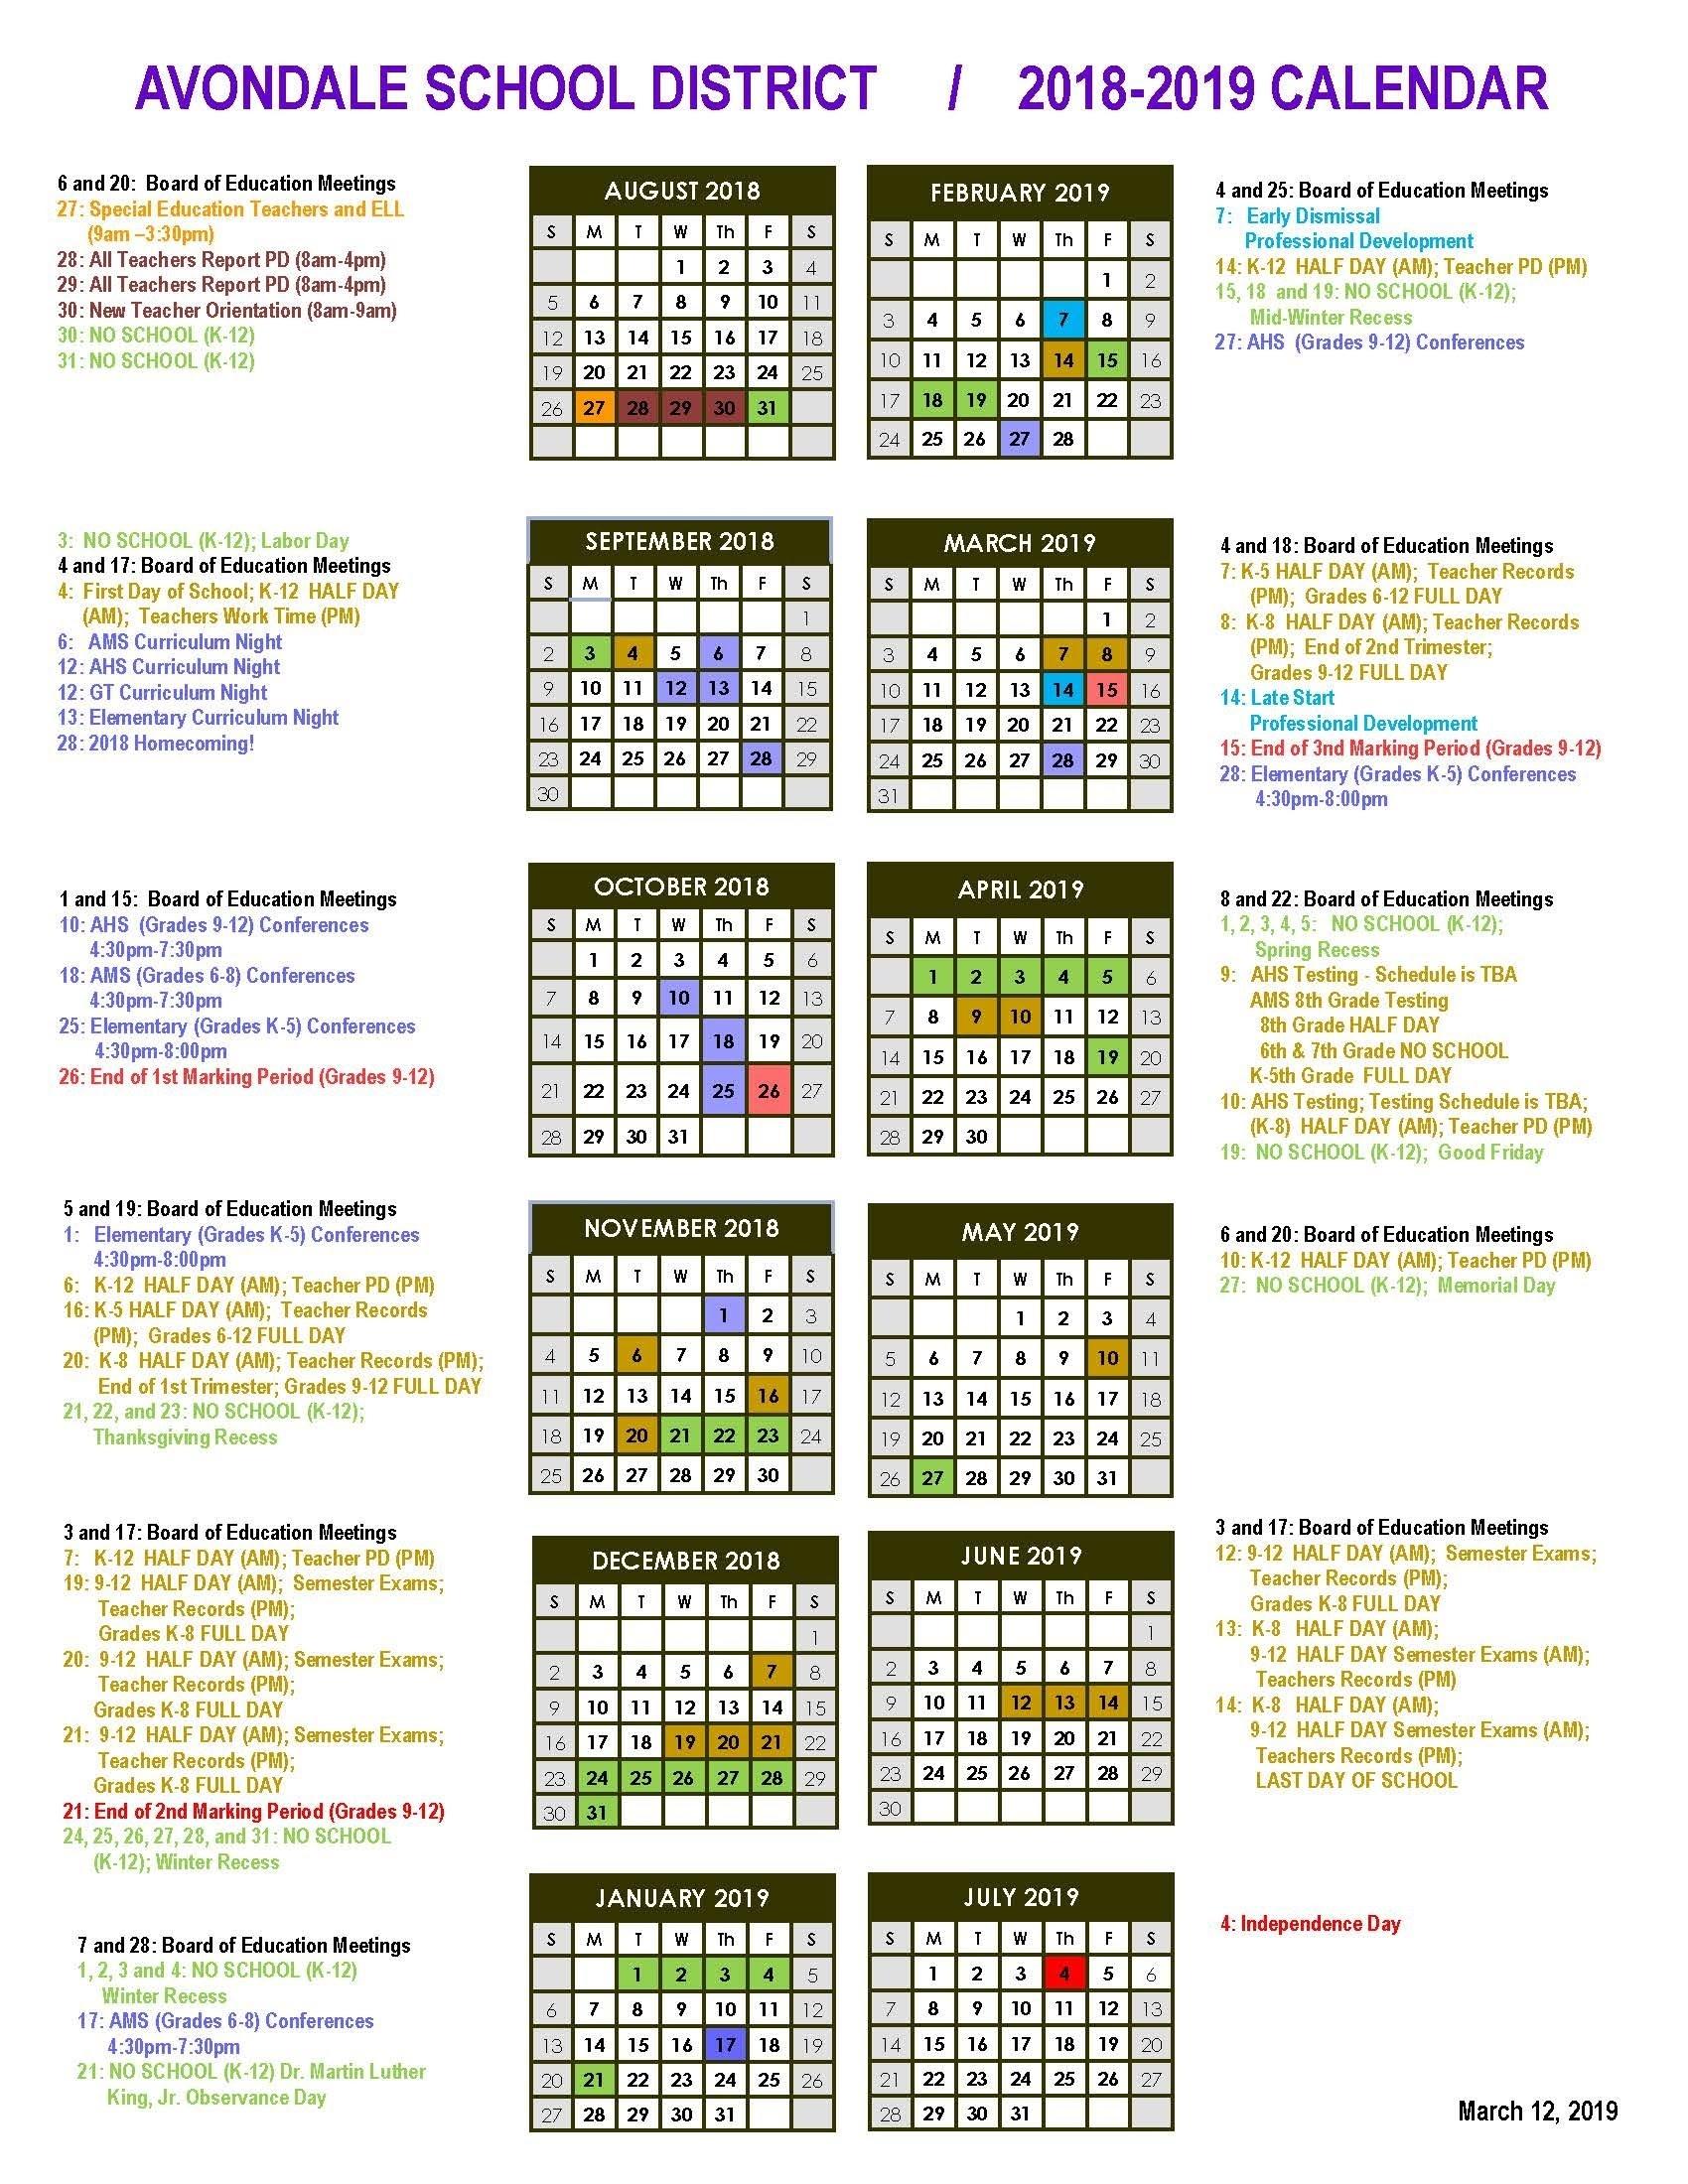 District Calendar - Avondale School District_District 8 School Calendar